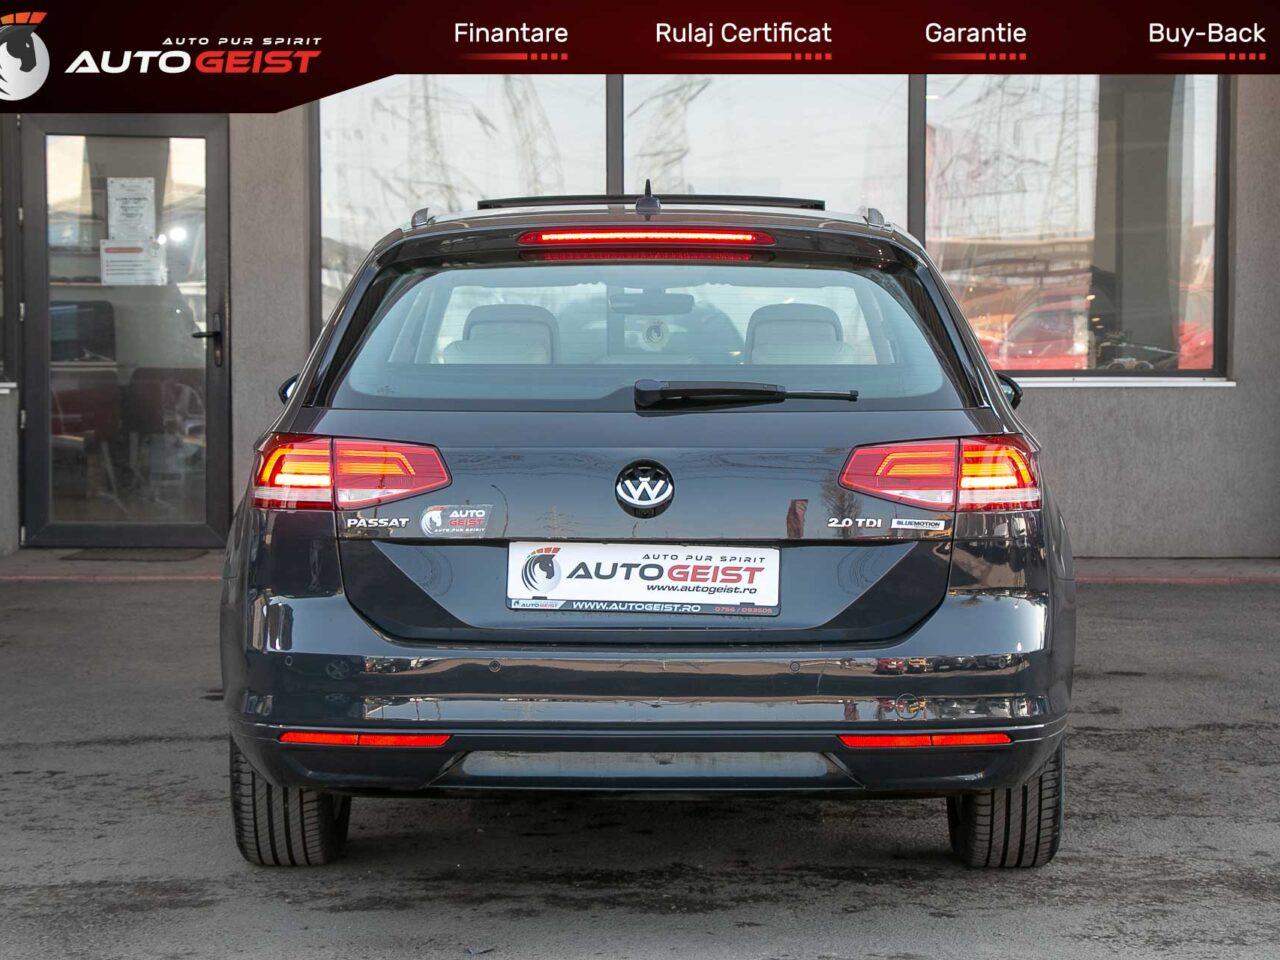 VW-PASSAT-break-panoramic-4504